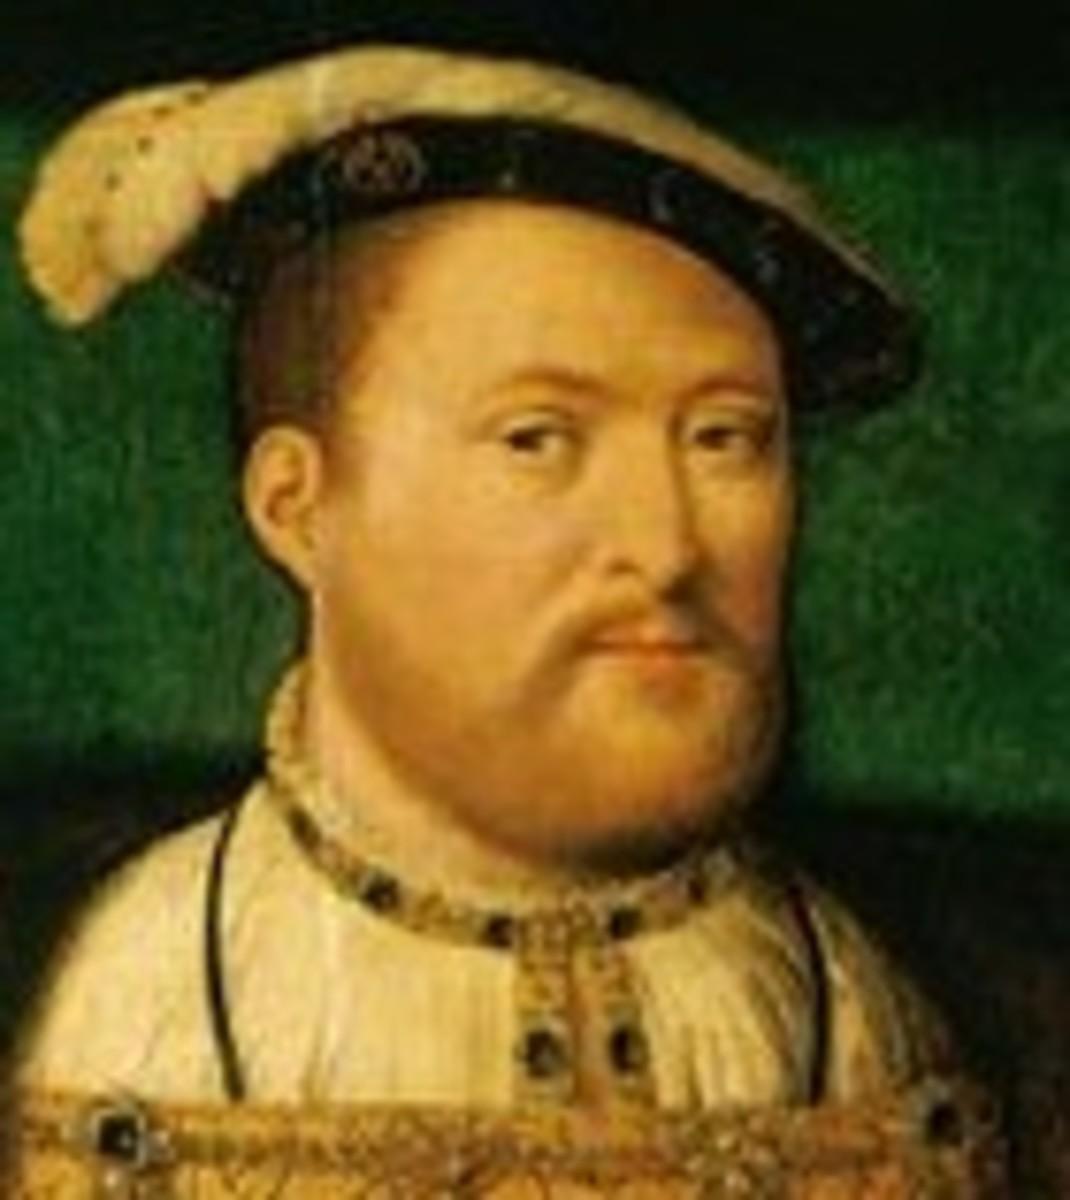 Tudor royals typically had red hair.